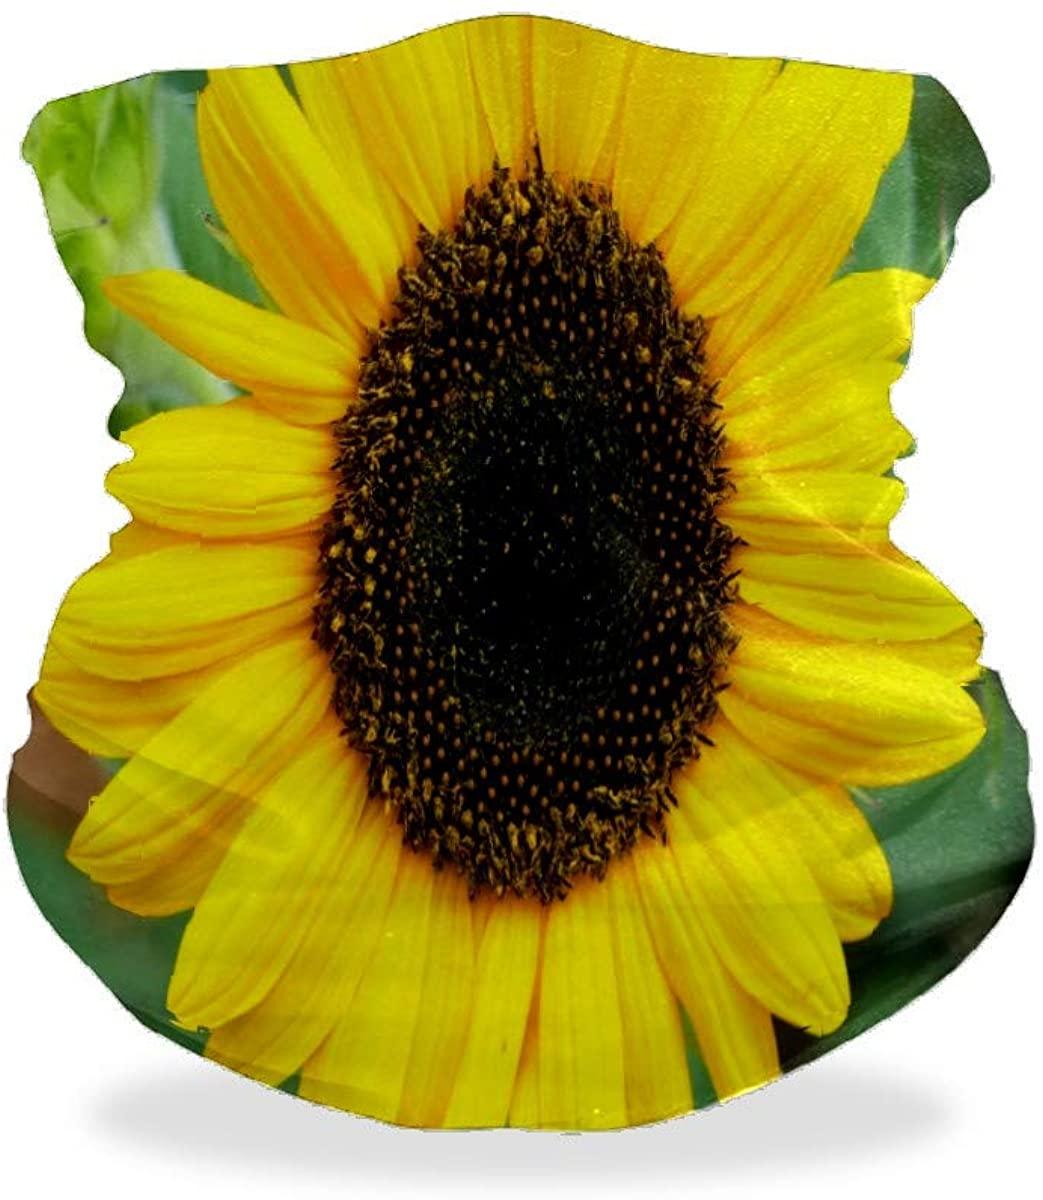 Sunflower Flower Blossom Sun Bandana Face Mask for Dust Wind UV Sun Product Neck Gaiter Helmet Liner Headwear Balaclava Scarf Outdoors Mask for Women Men Adults Kids